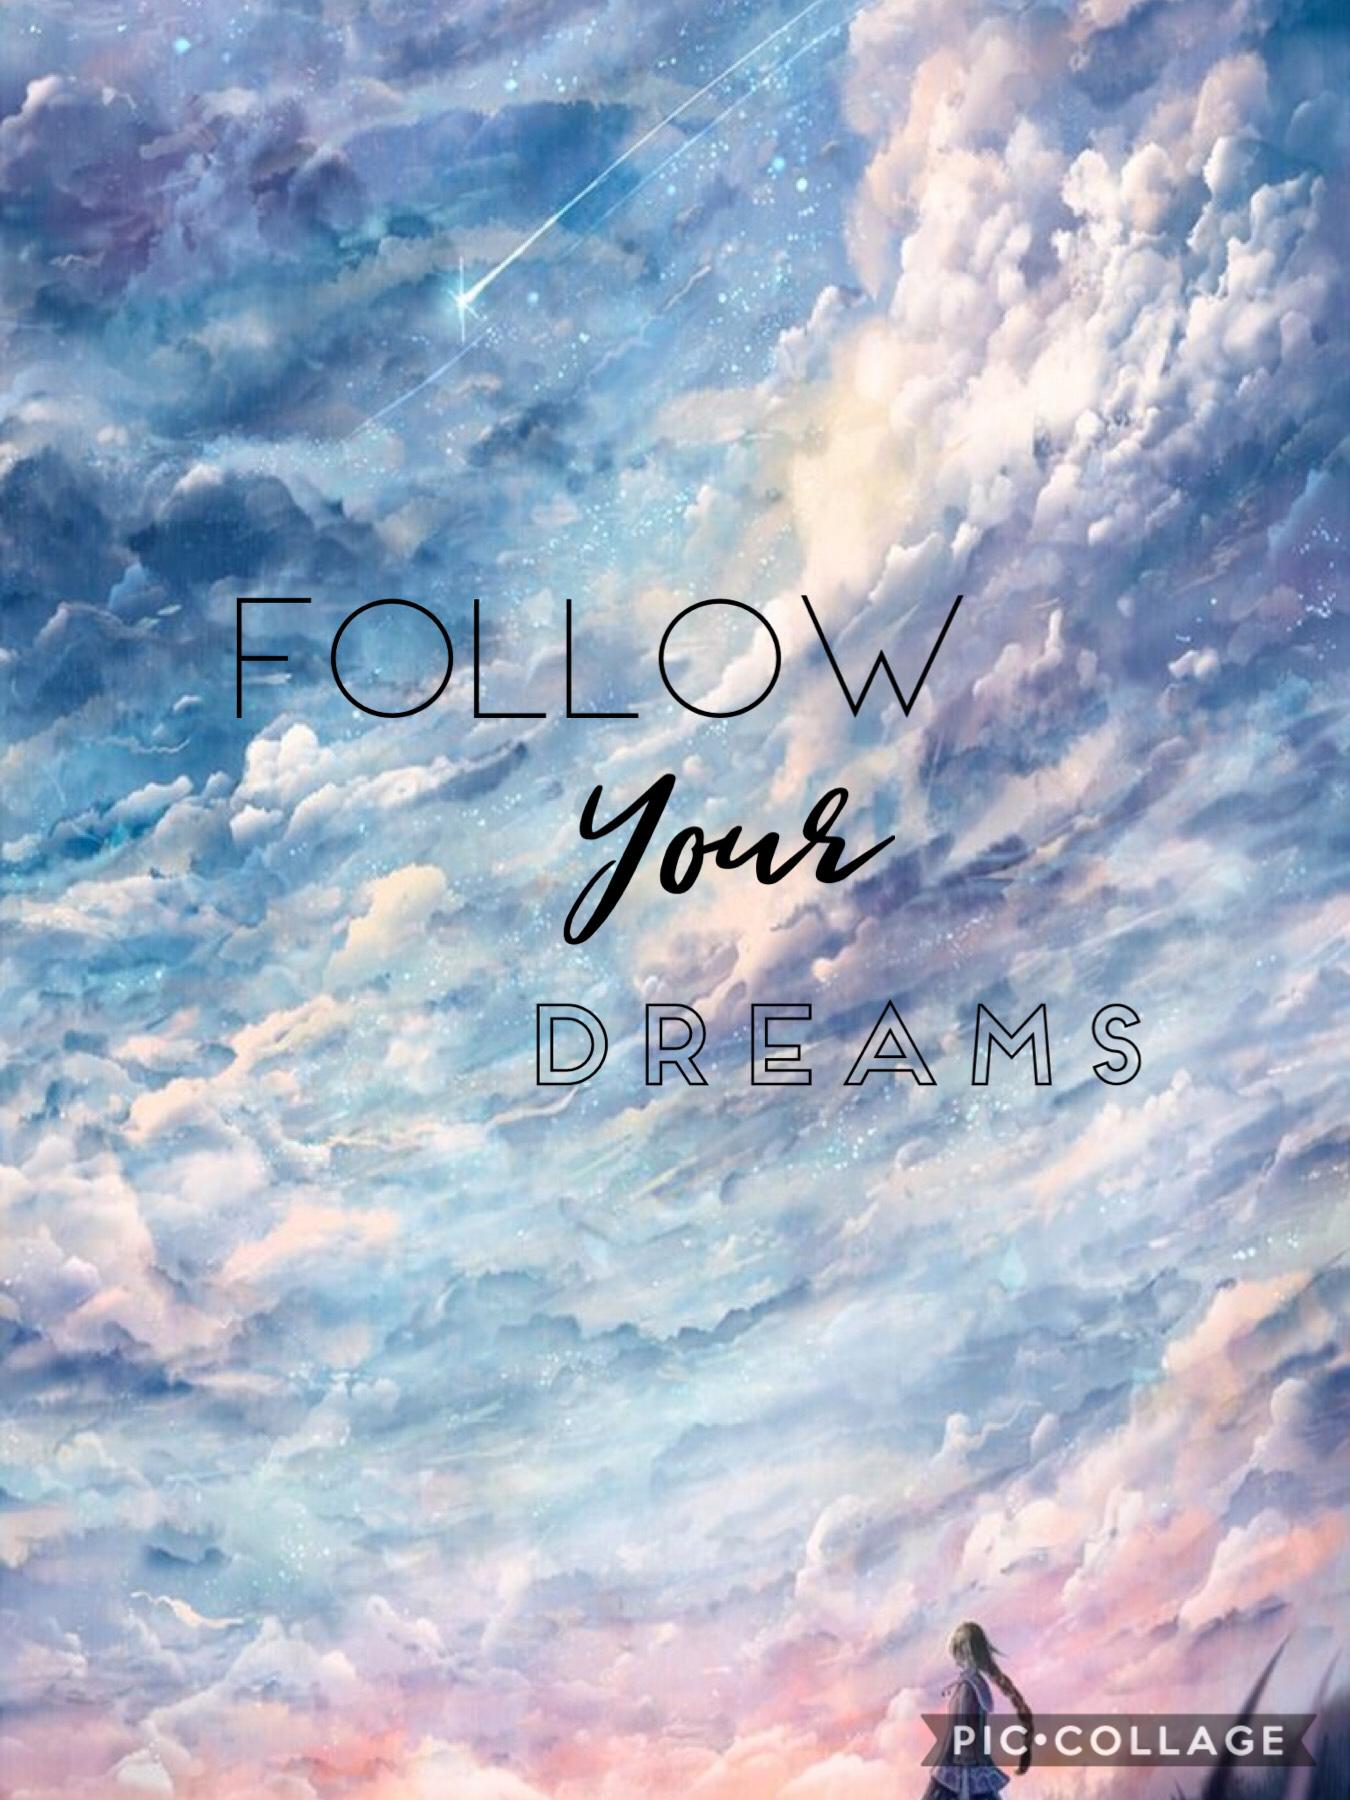 #Follow your dreams